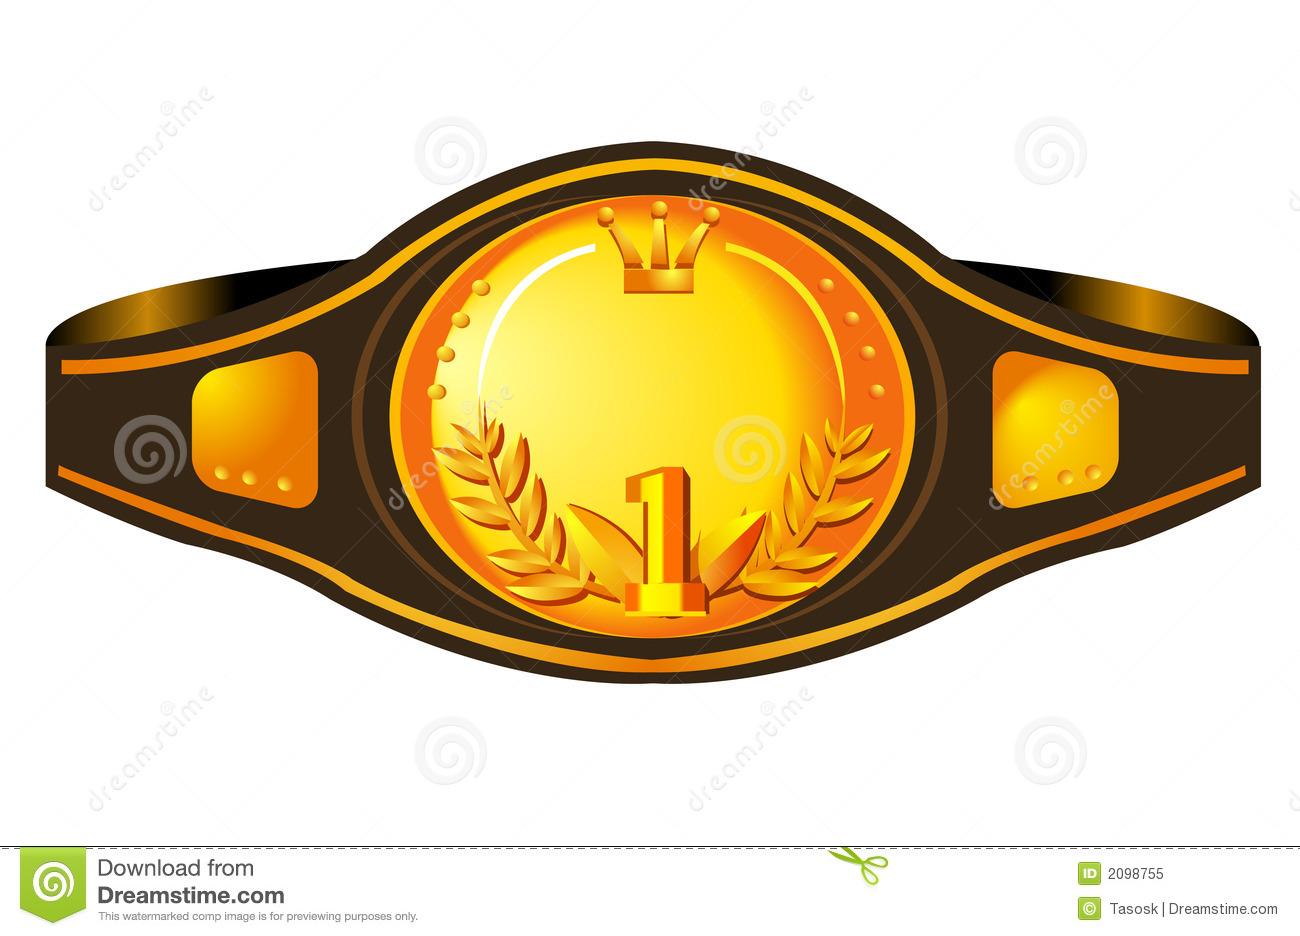 Wwe championship belt clipart.